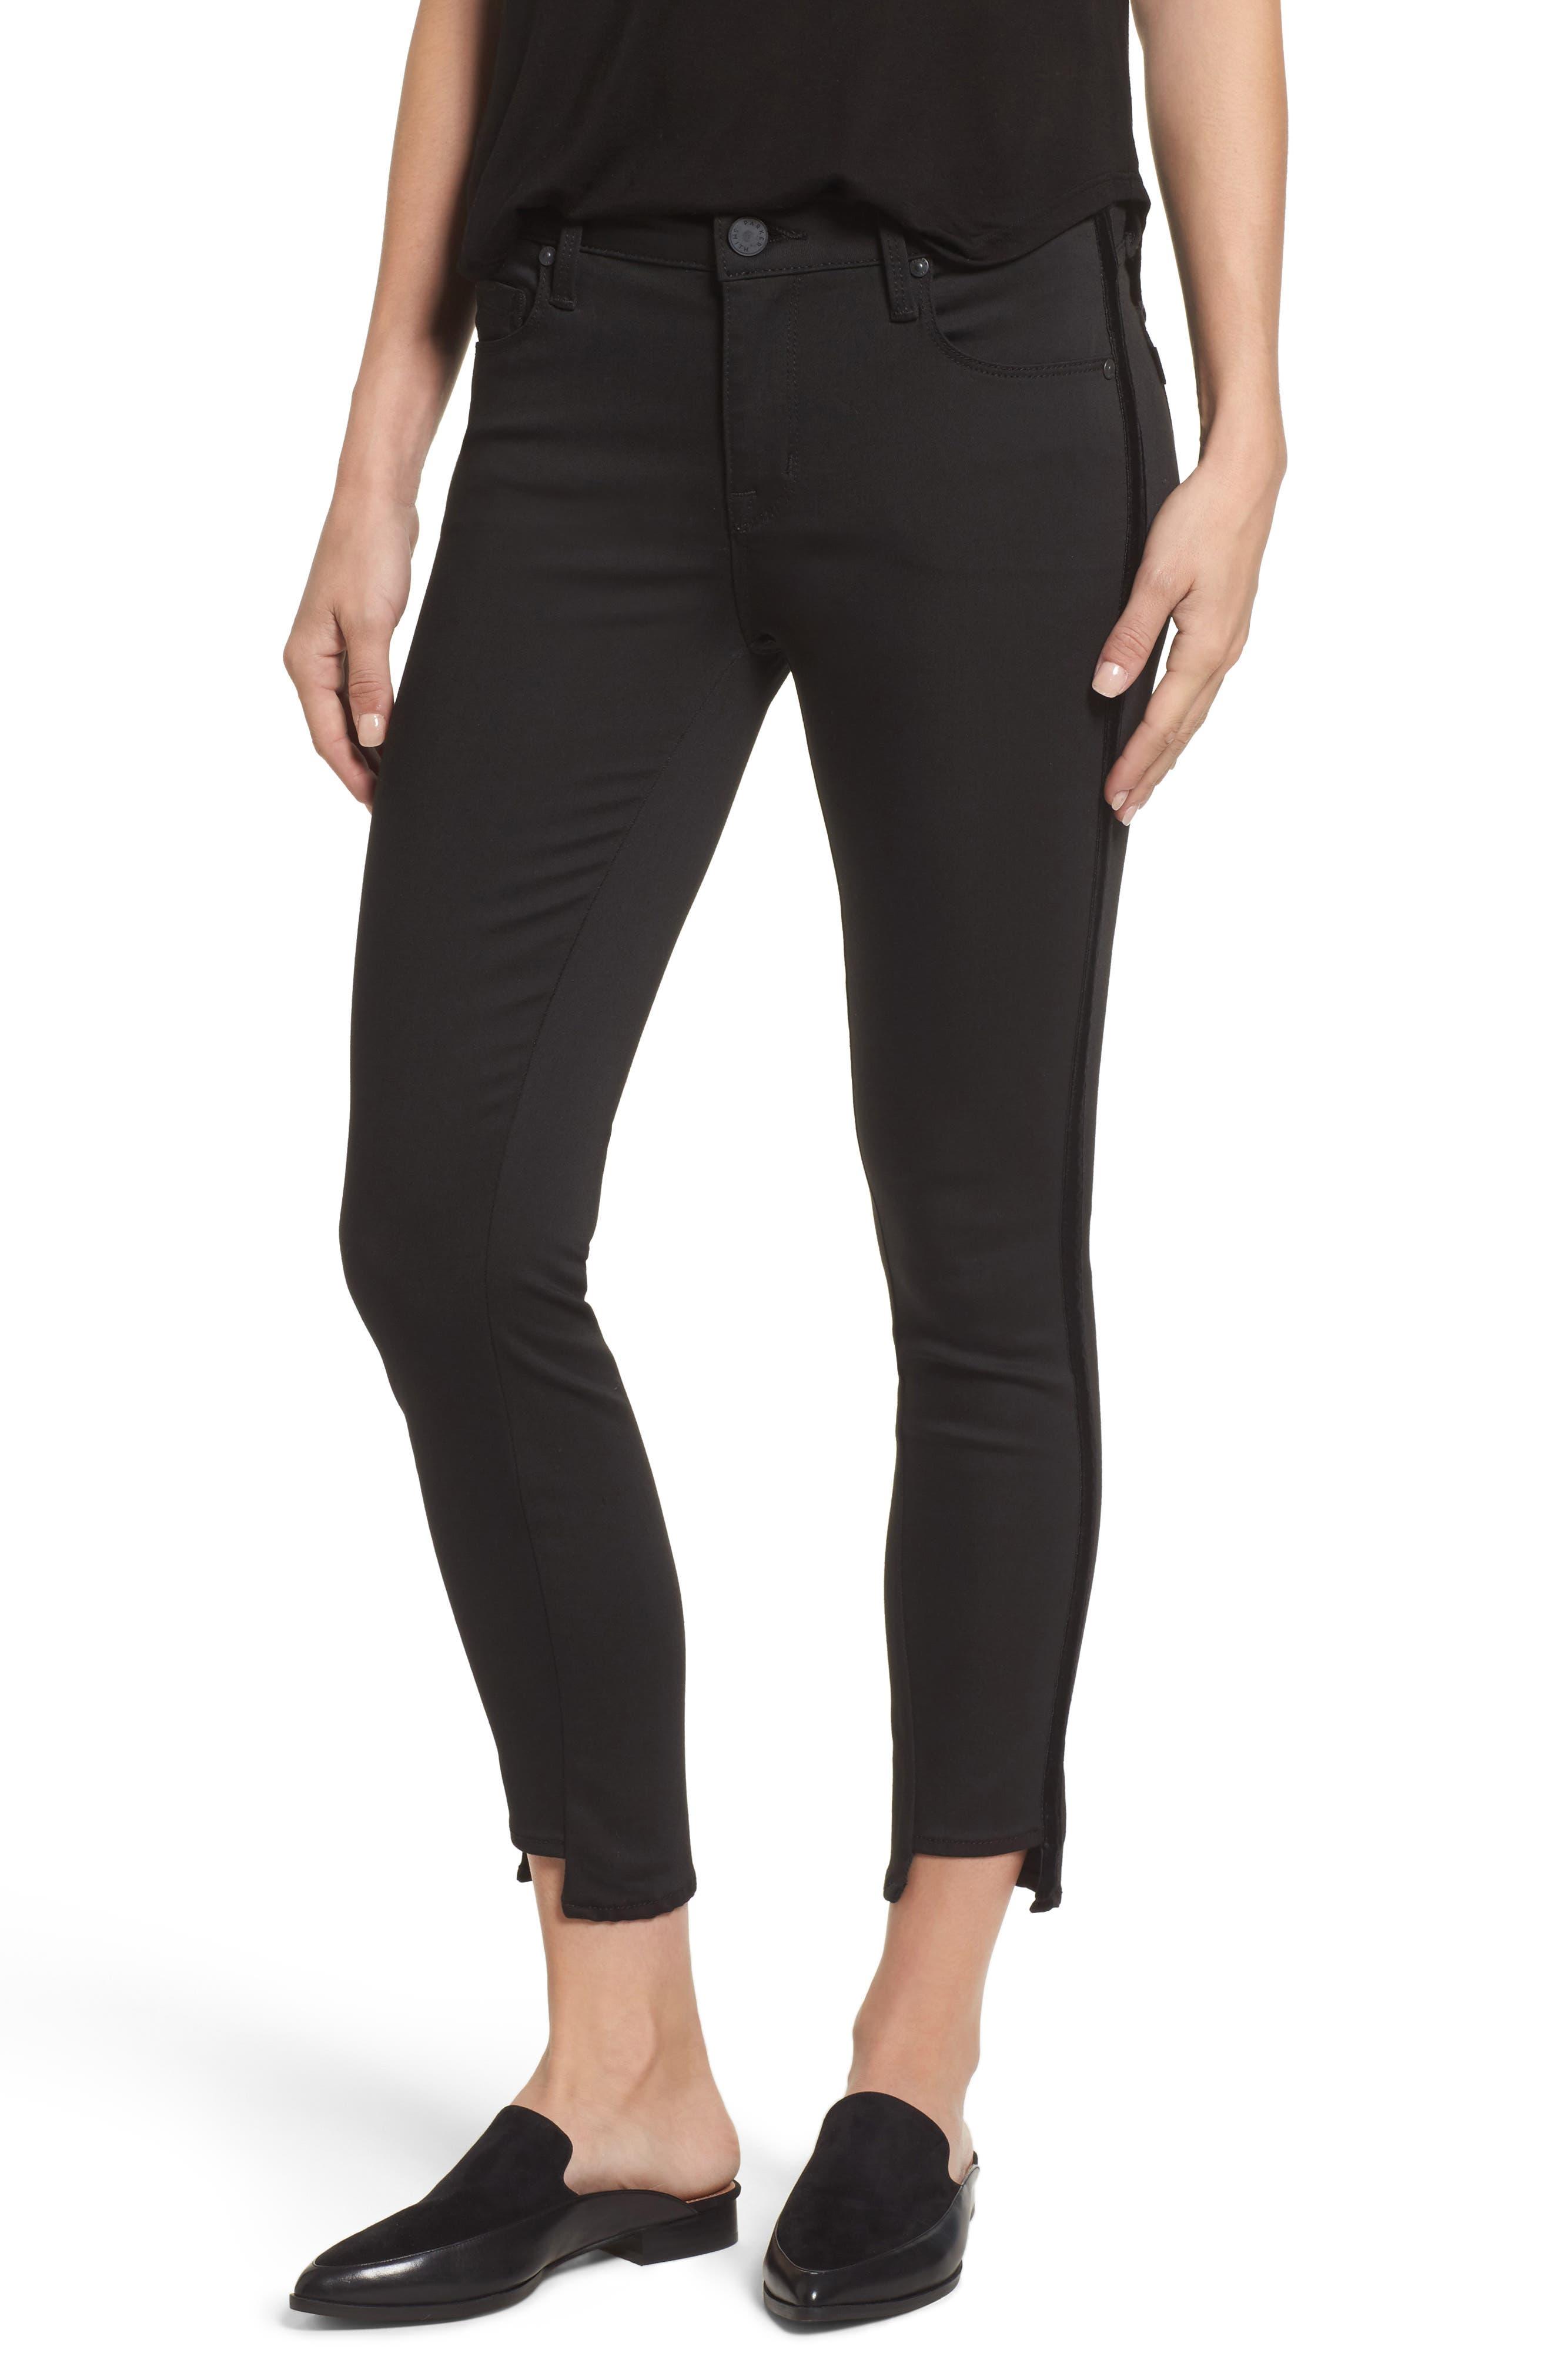 Main Image - PARKER SMITH Twisted Tuxedo Crop Skinny Jeans (Eternal Black)